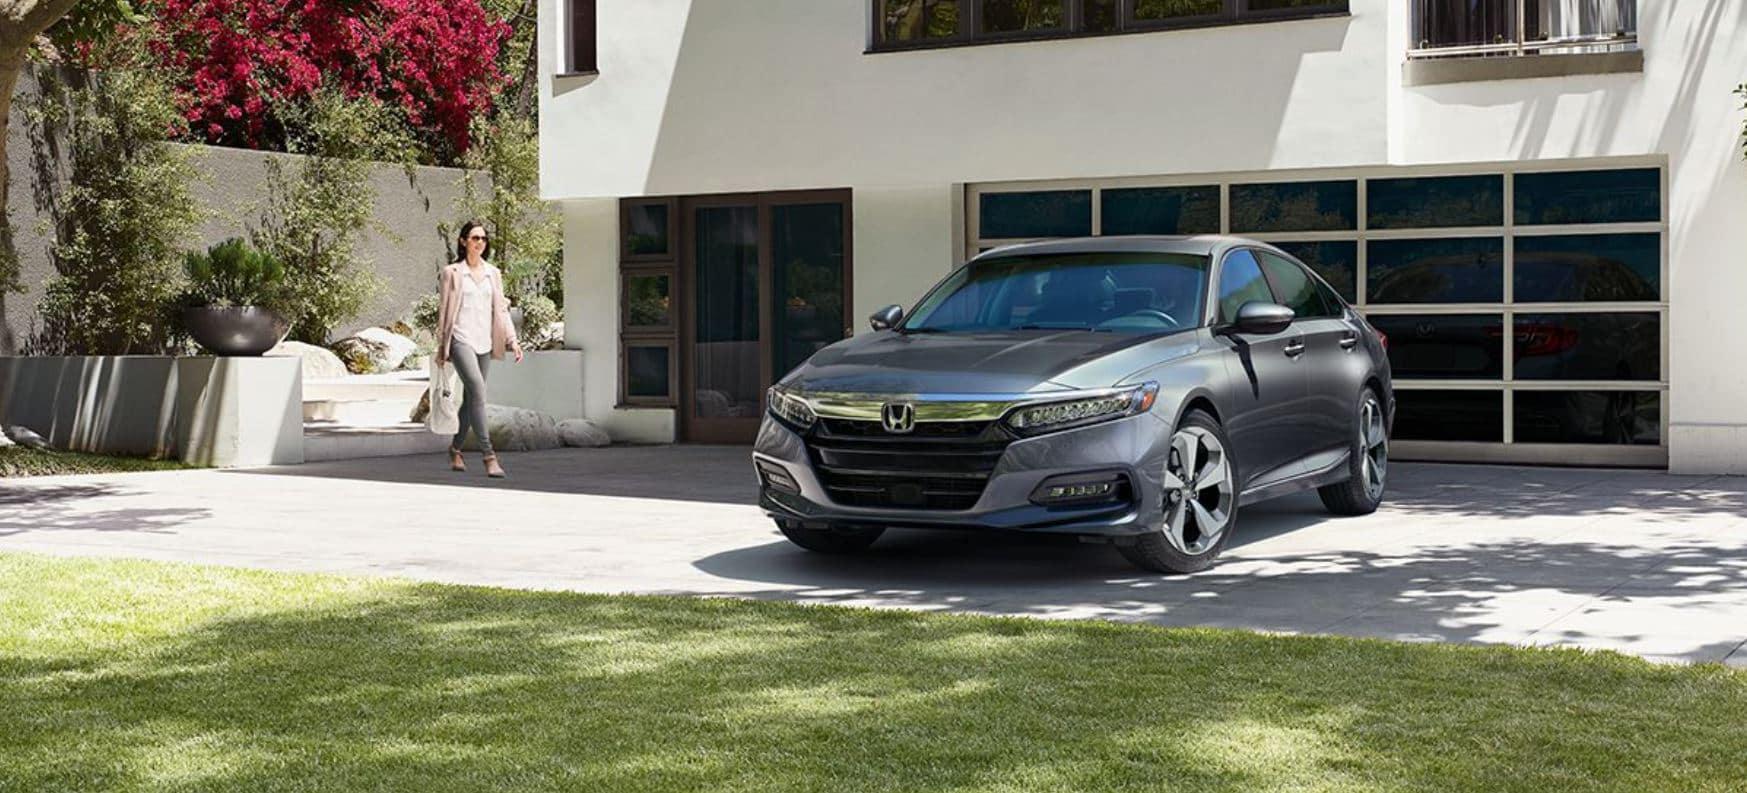 2020 honda accord parked outside home near schaller honda of new britain